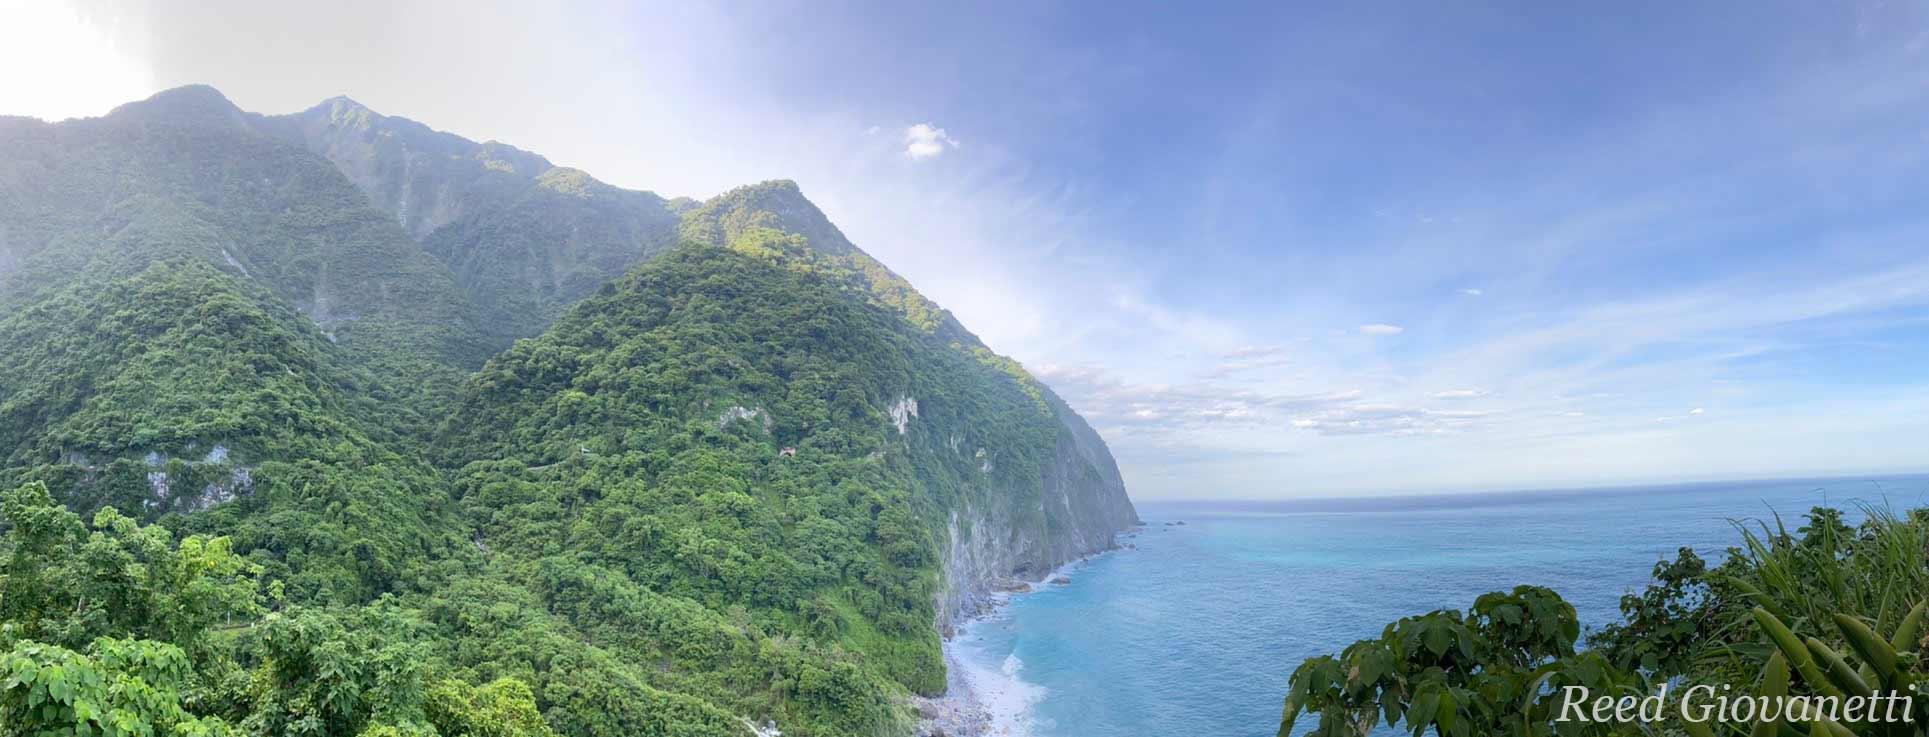 qingshui cliffs hualien